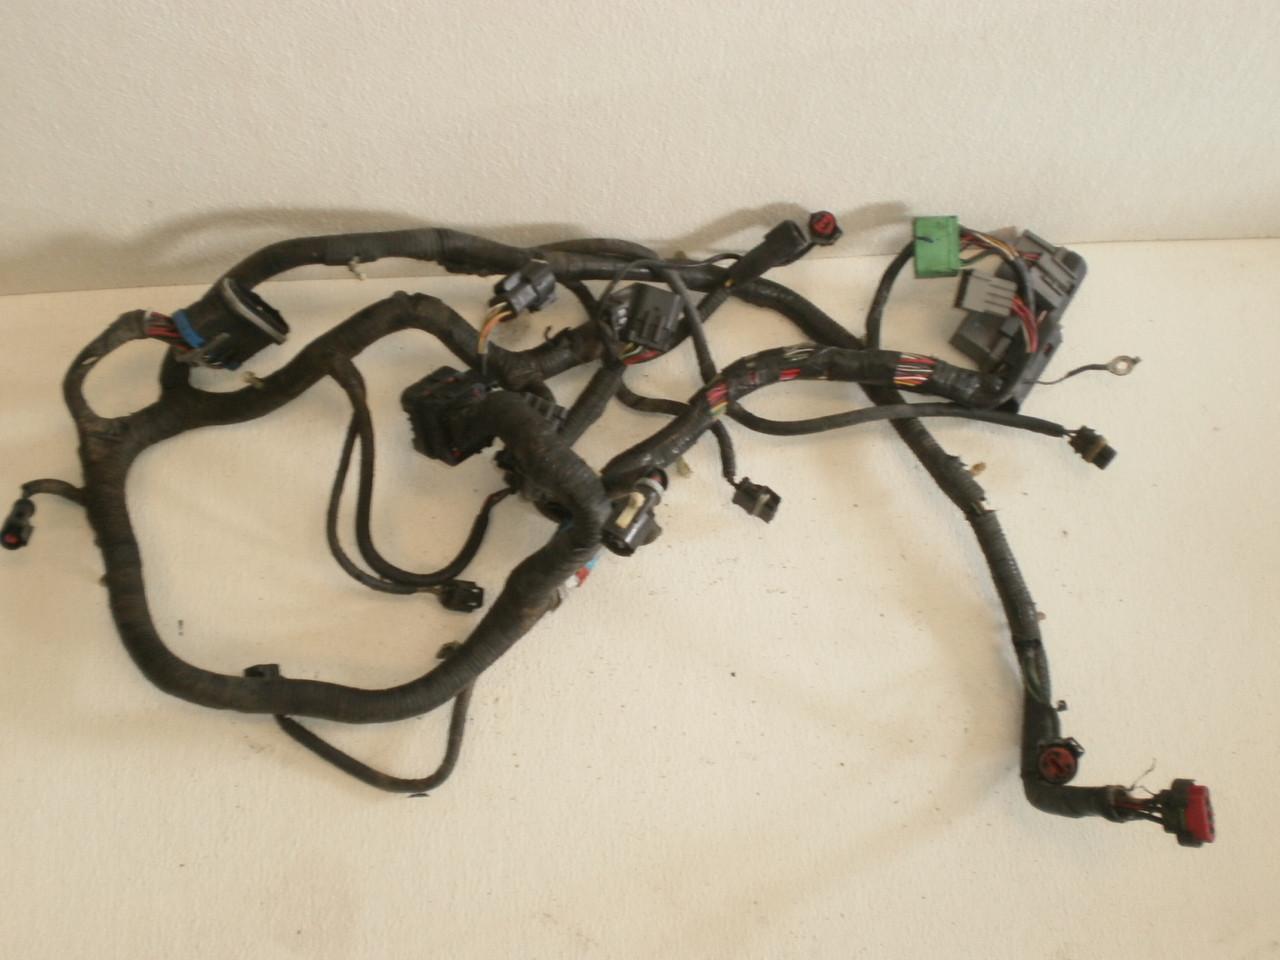 2001 mustang wiring harness wiring diagram inside 2001 ford mustang radio wiring harness 2001 mustang wiring harness [ 1280 x 960 Pixel ]